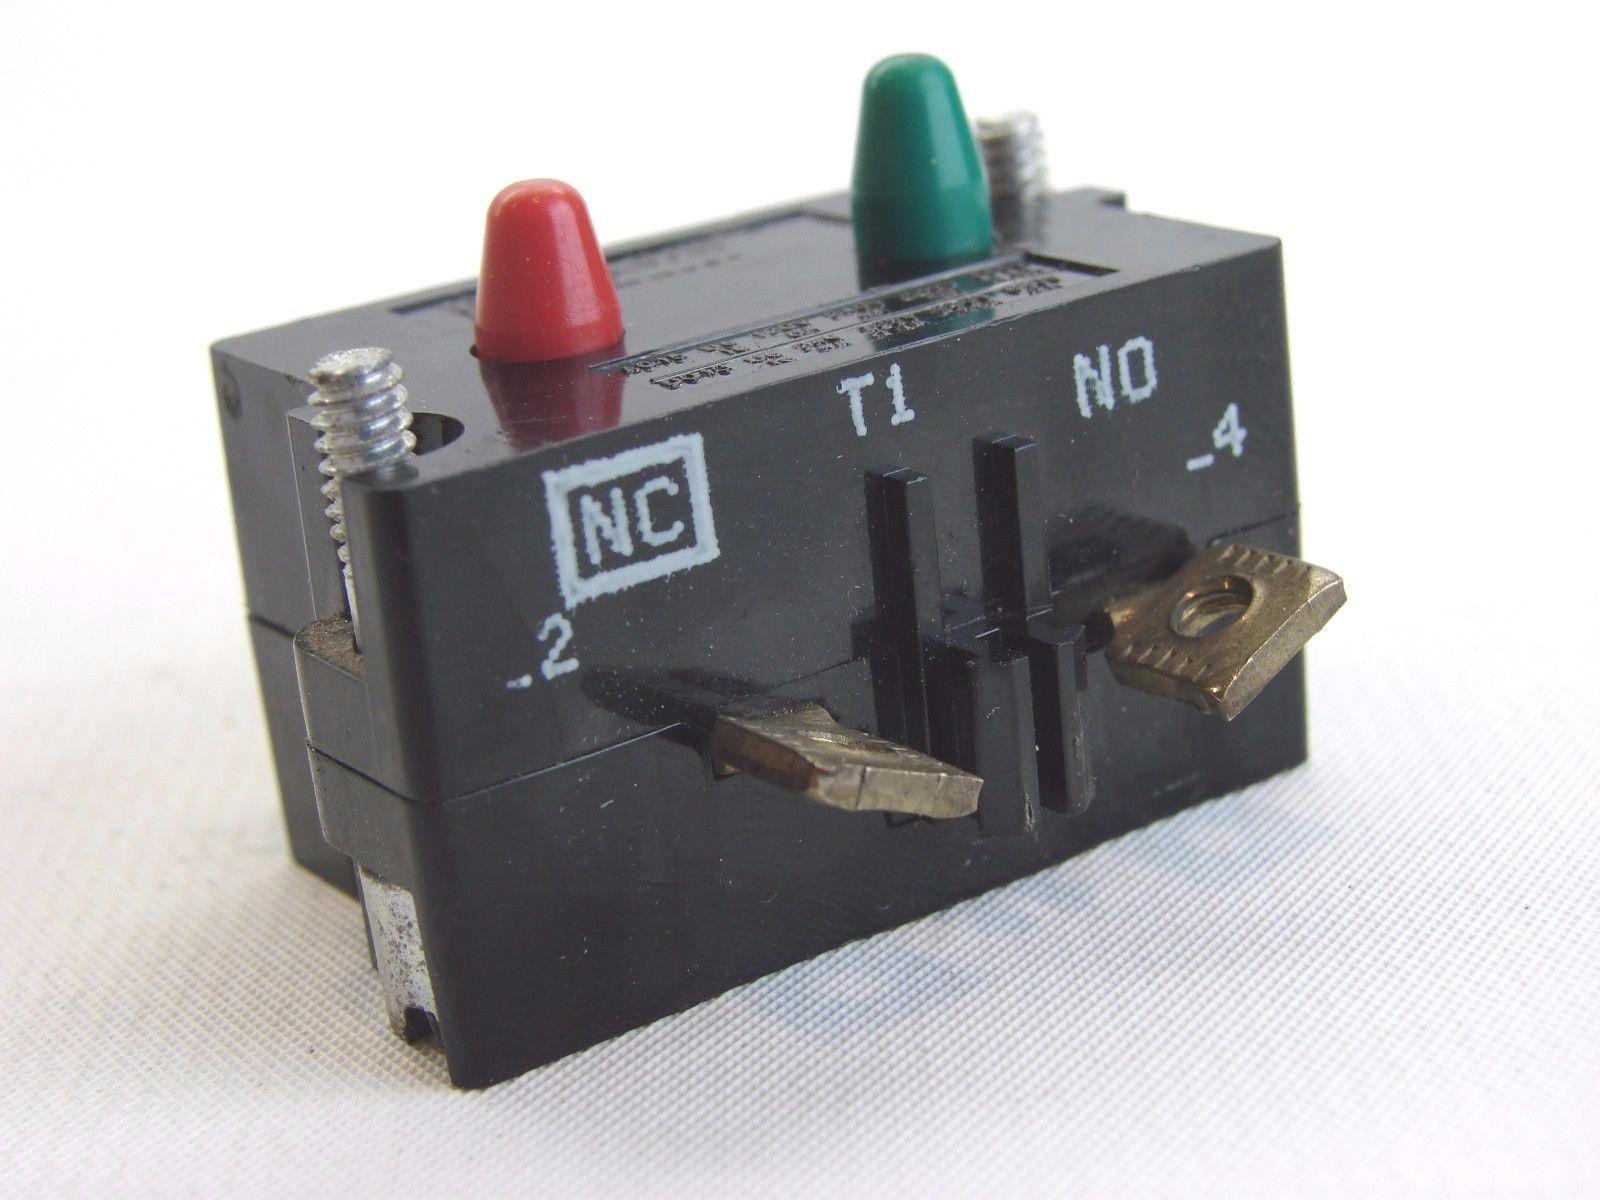 1 N.C. Cutler Hammer 10250T1 Eaton Contact Block 10250T//91000T 1 N.O